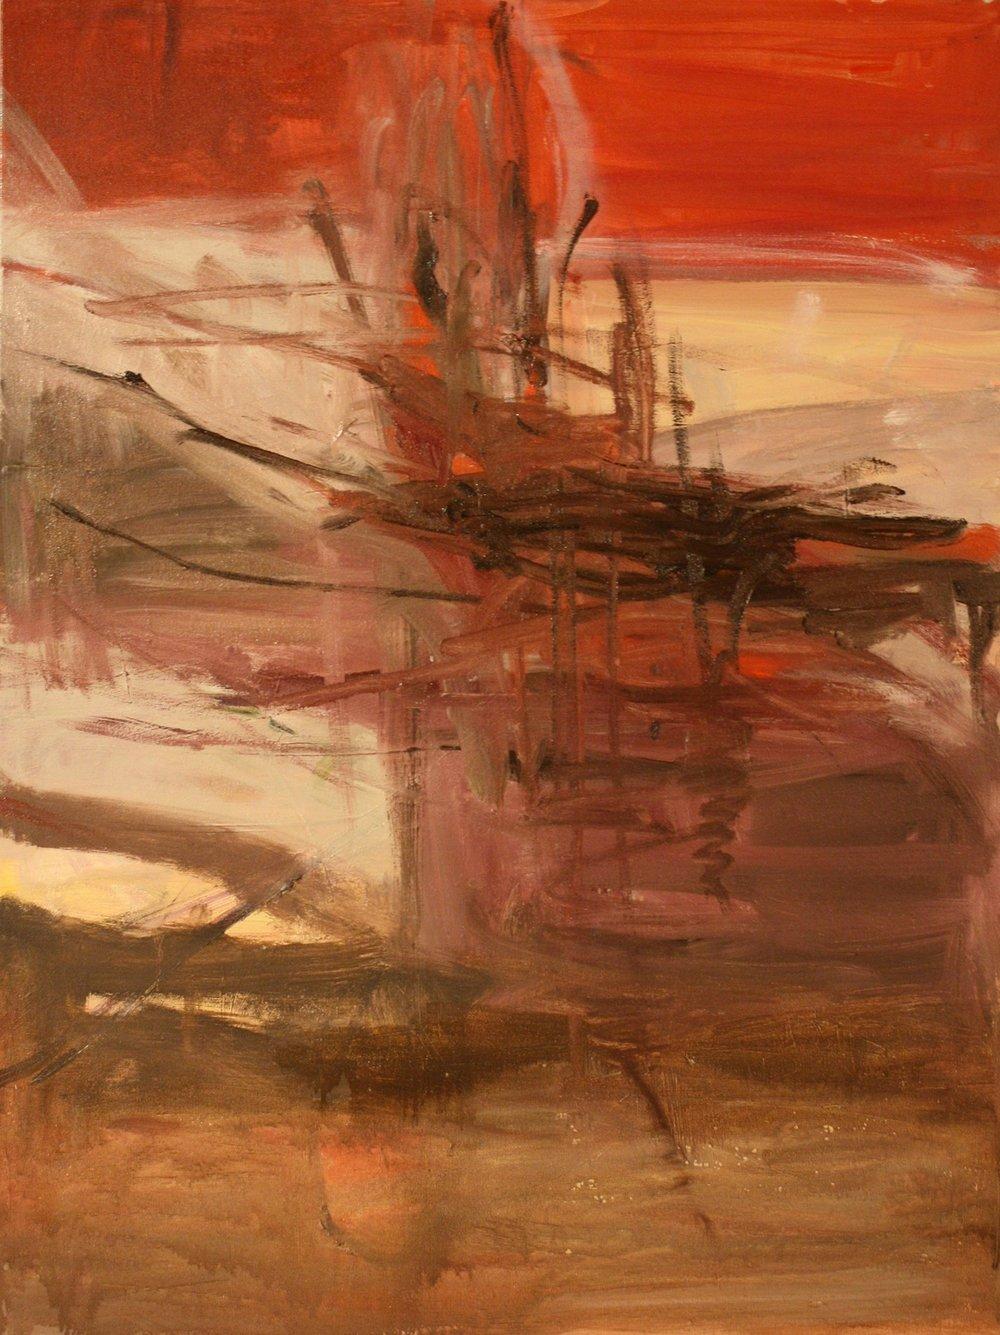 Painting_59_Red Study.jpg